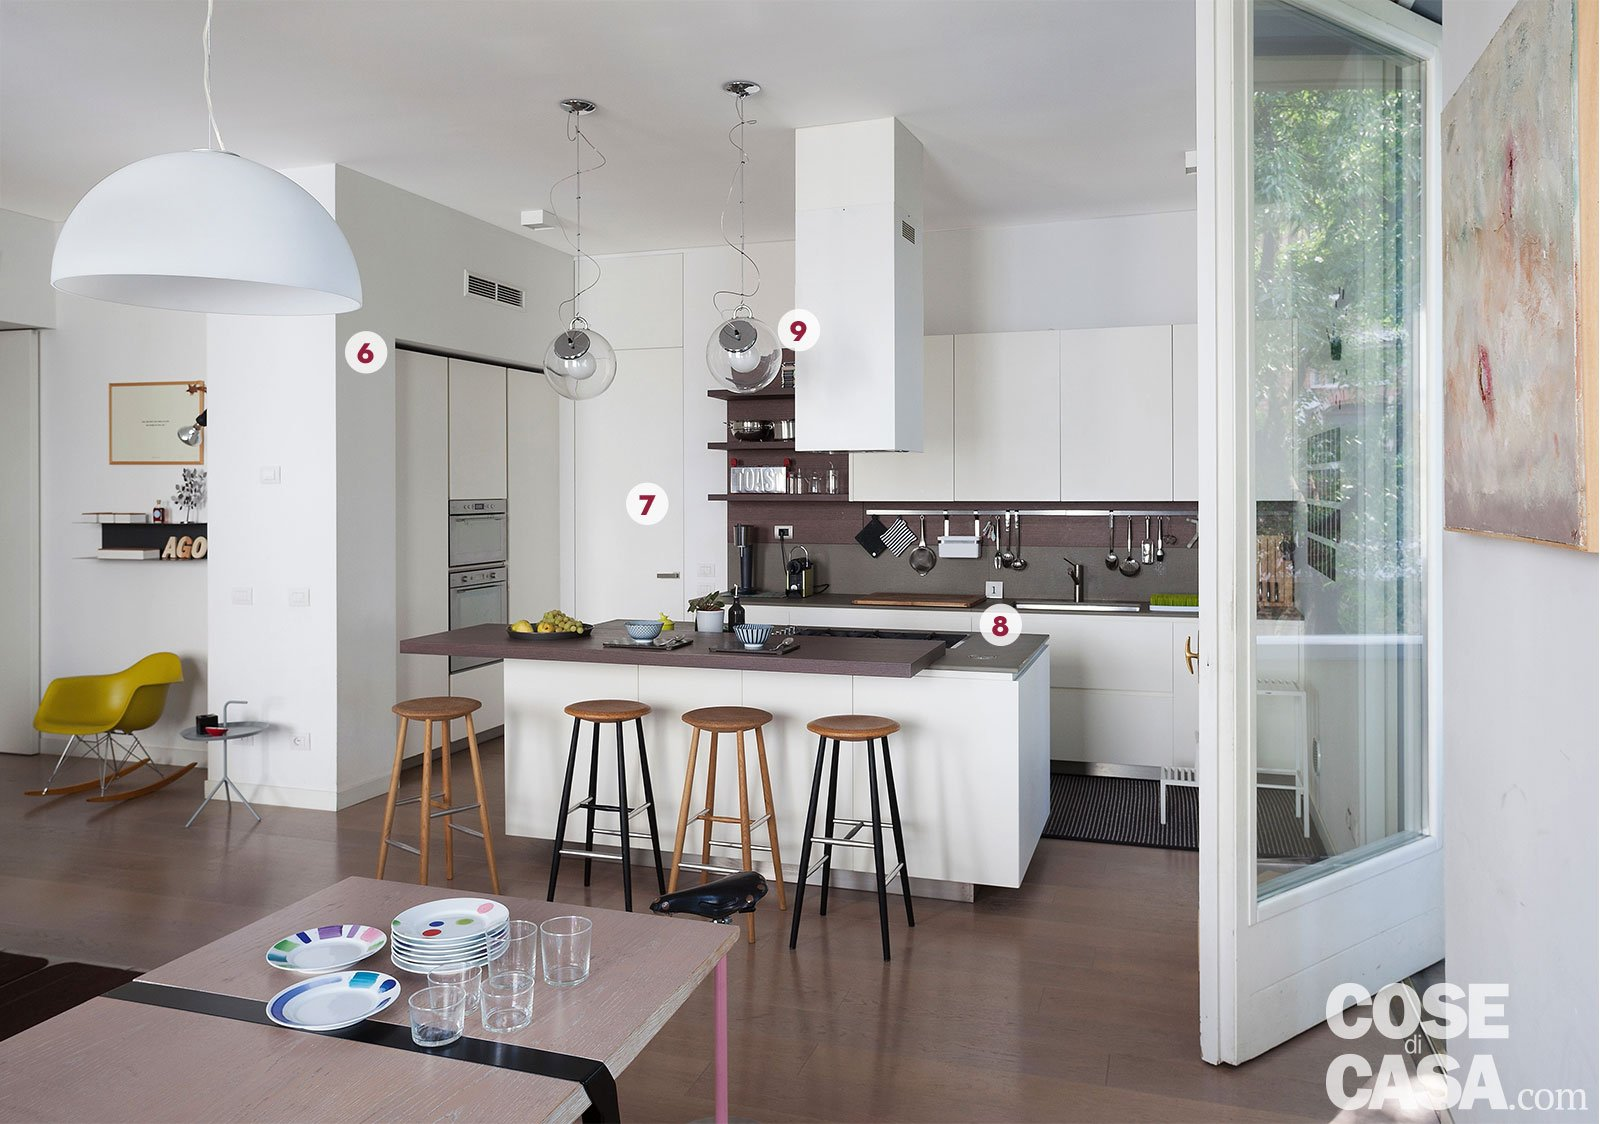 Idee cucina soggiorno ambiente unico free ingresso for Idee ambiente